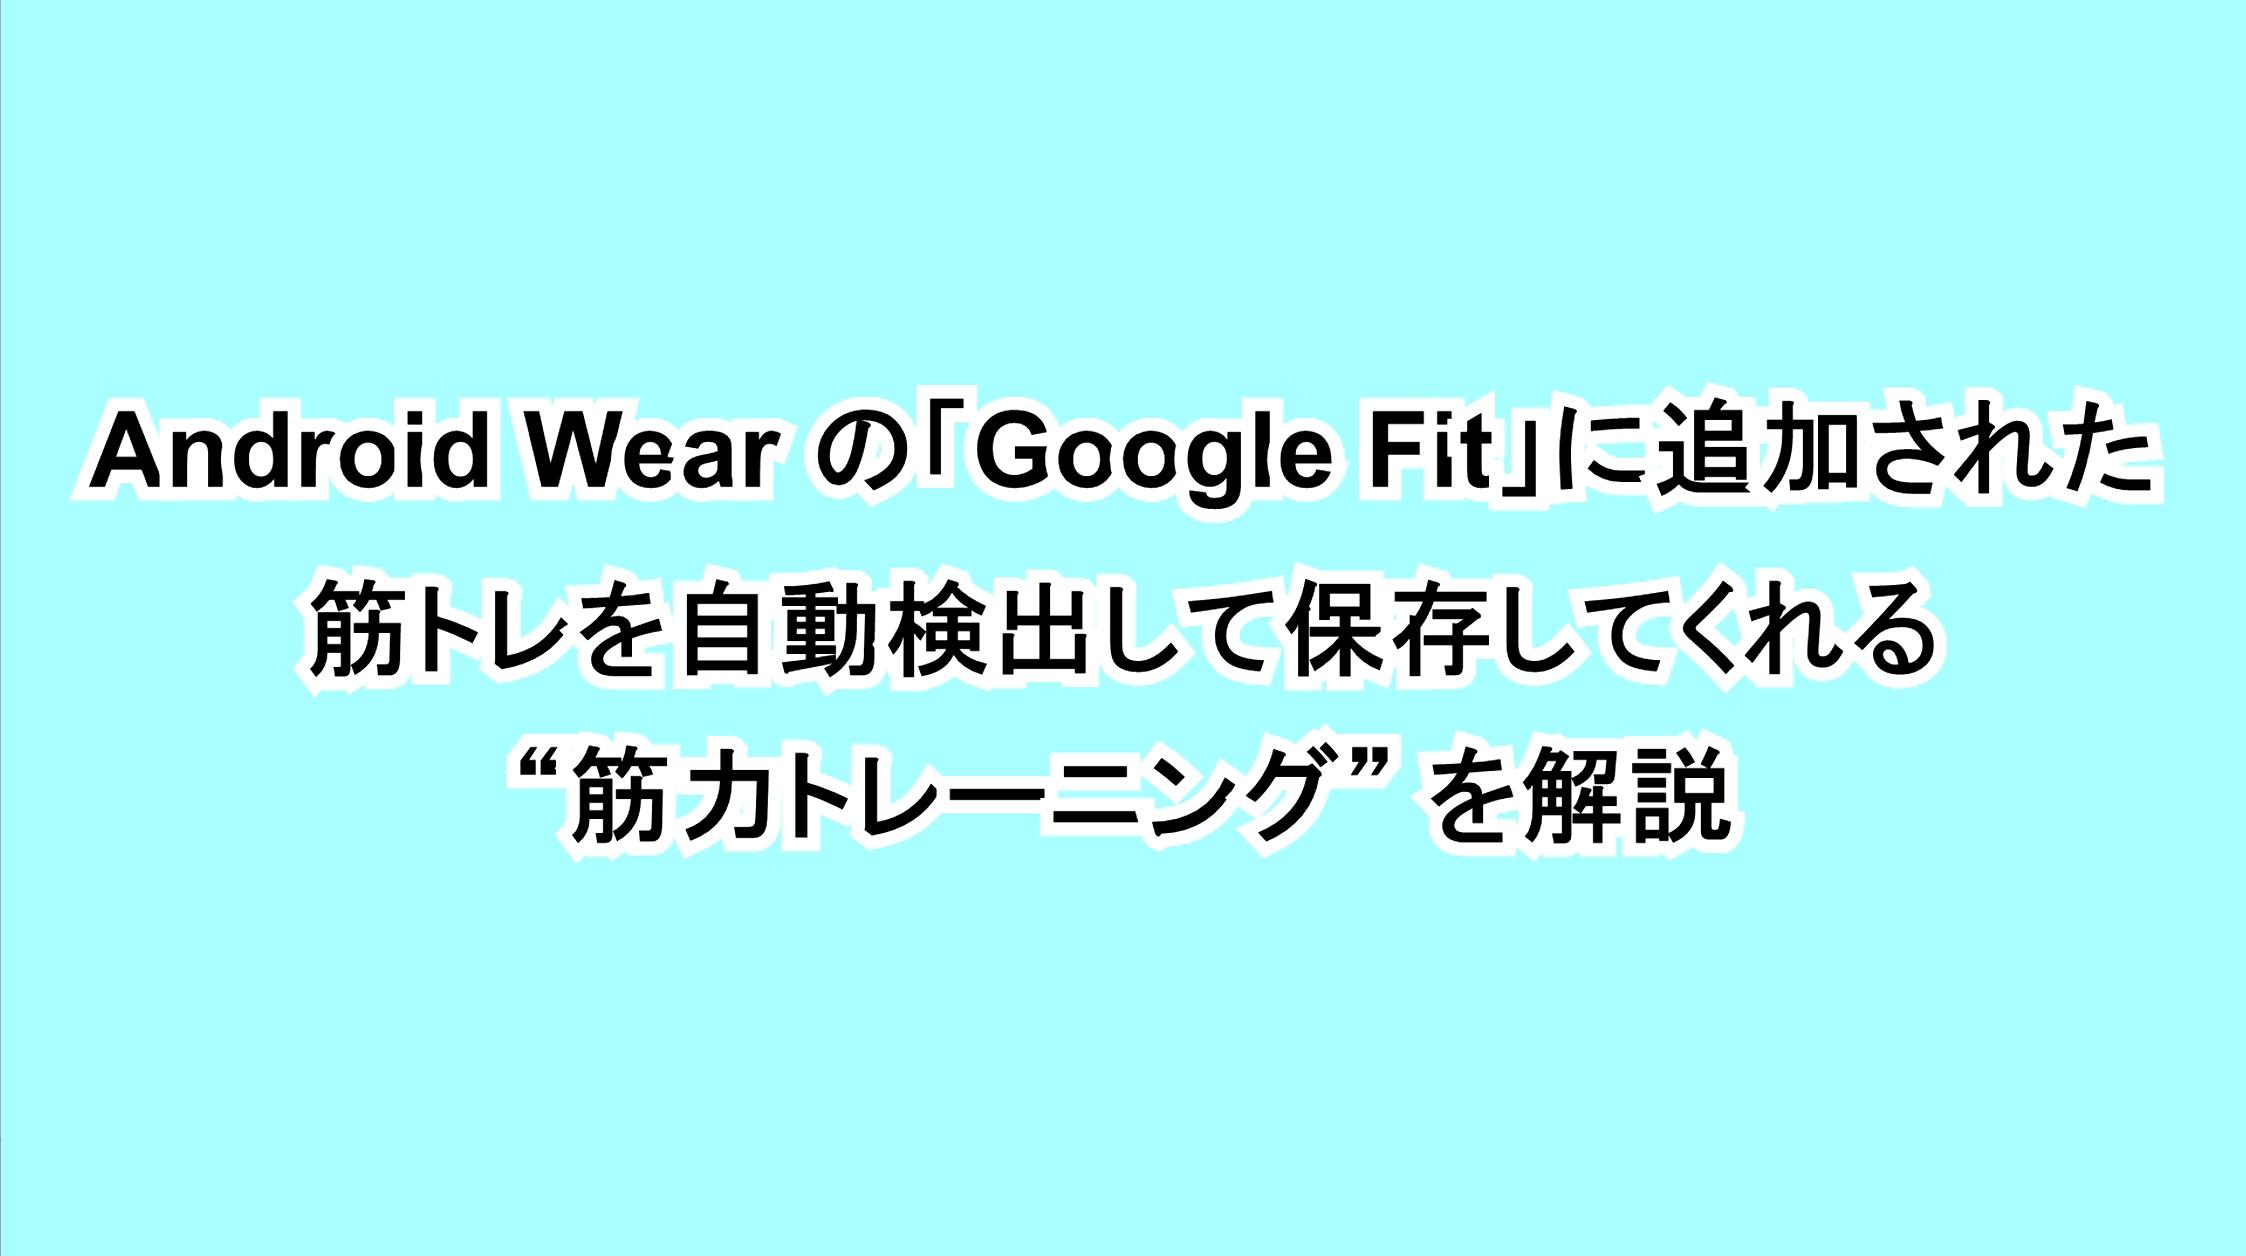 "Android Wearの「Google Fit」に追加された筋トレを自動検出して保存してくれる""筋力トレーニング""を解説"